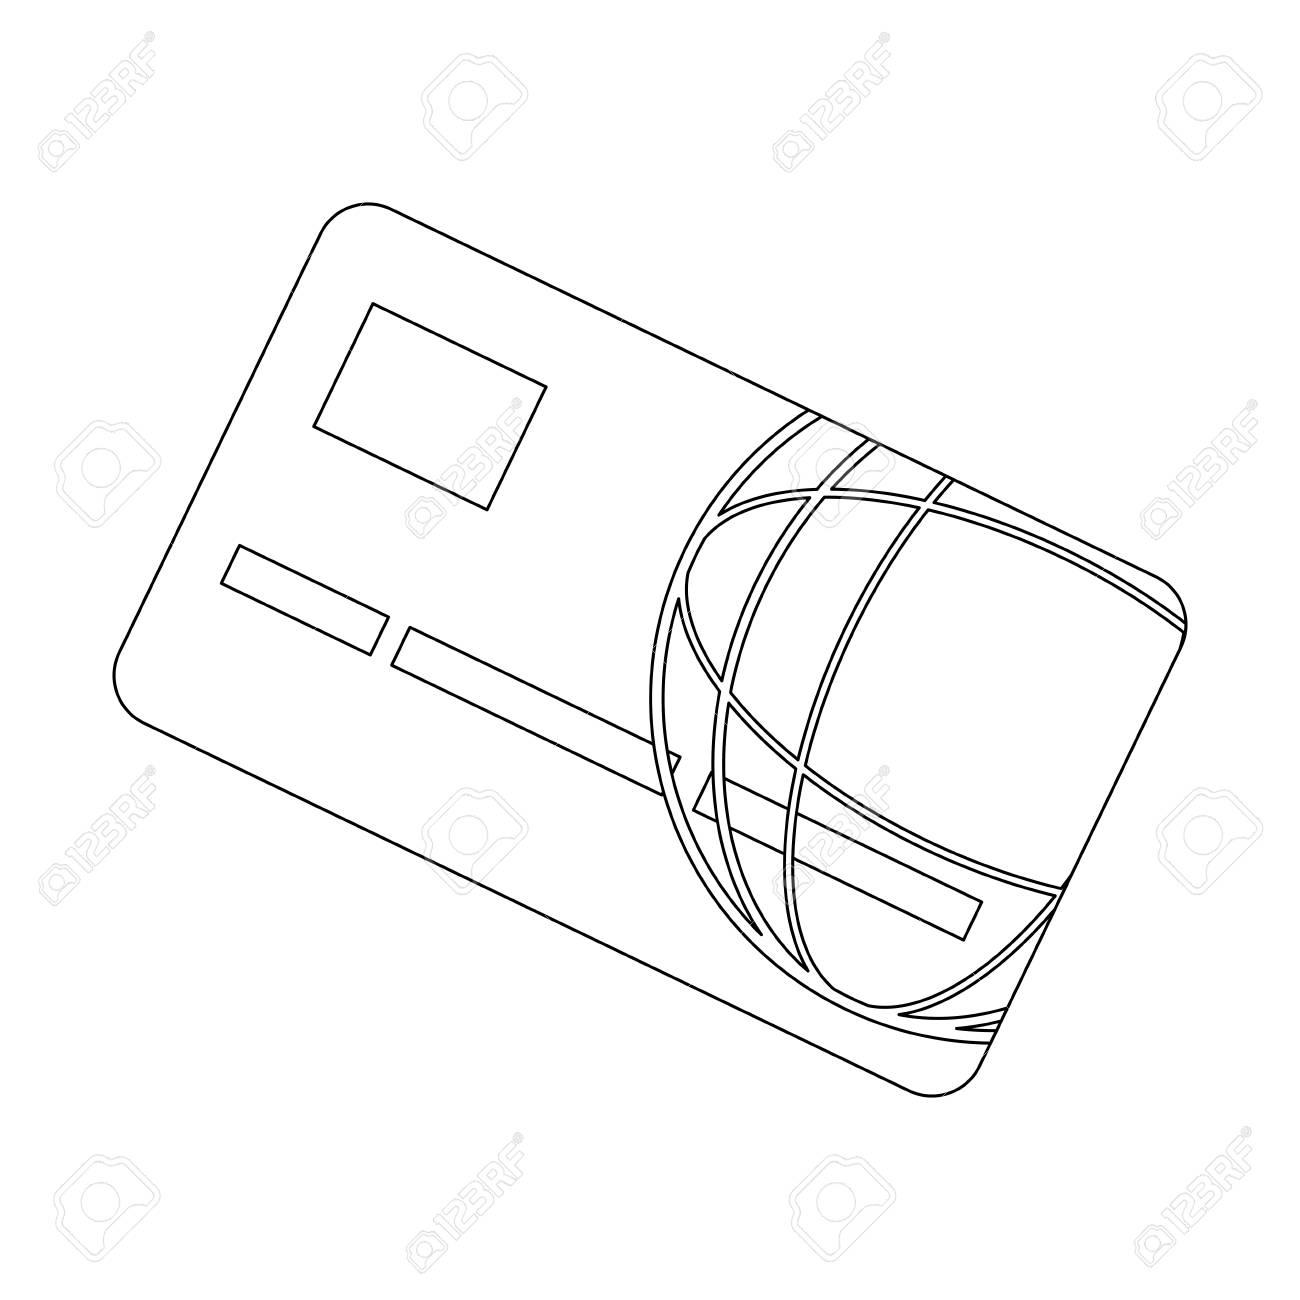 Bank card credit or debit finance security money vector illustration